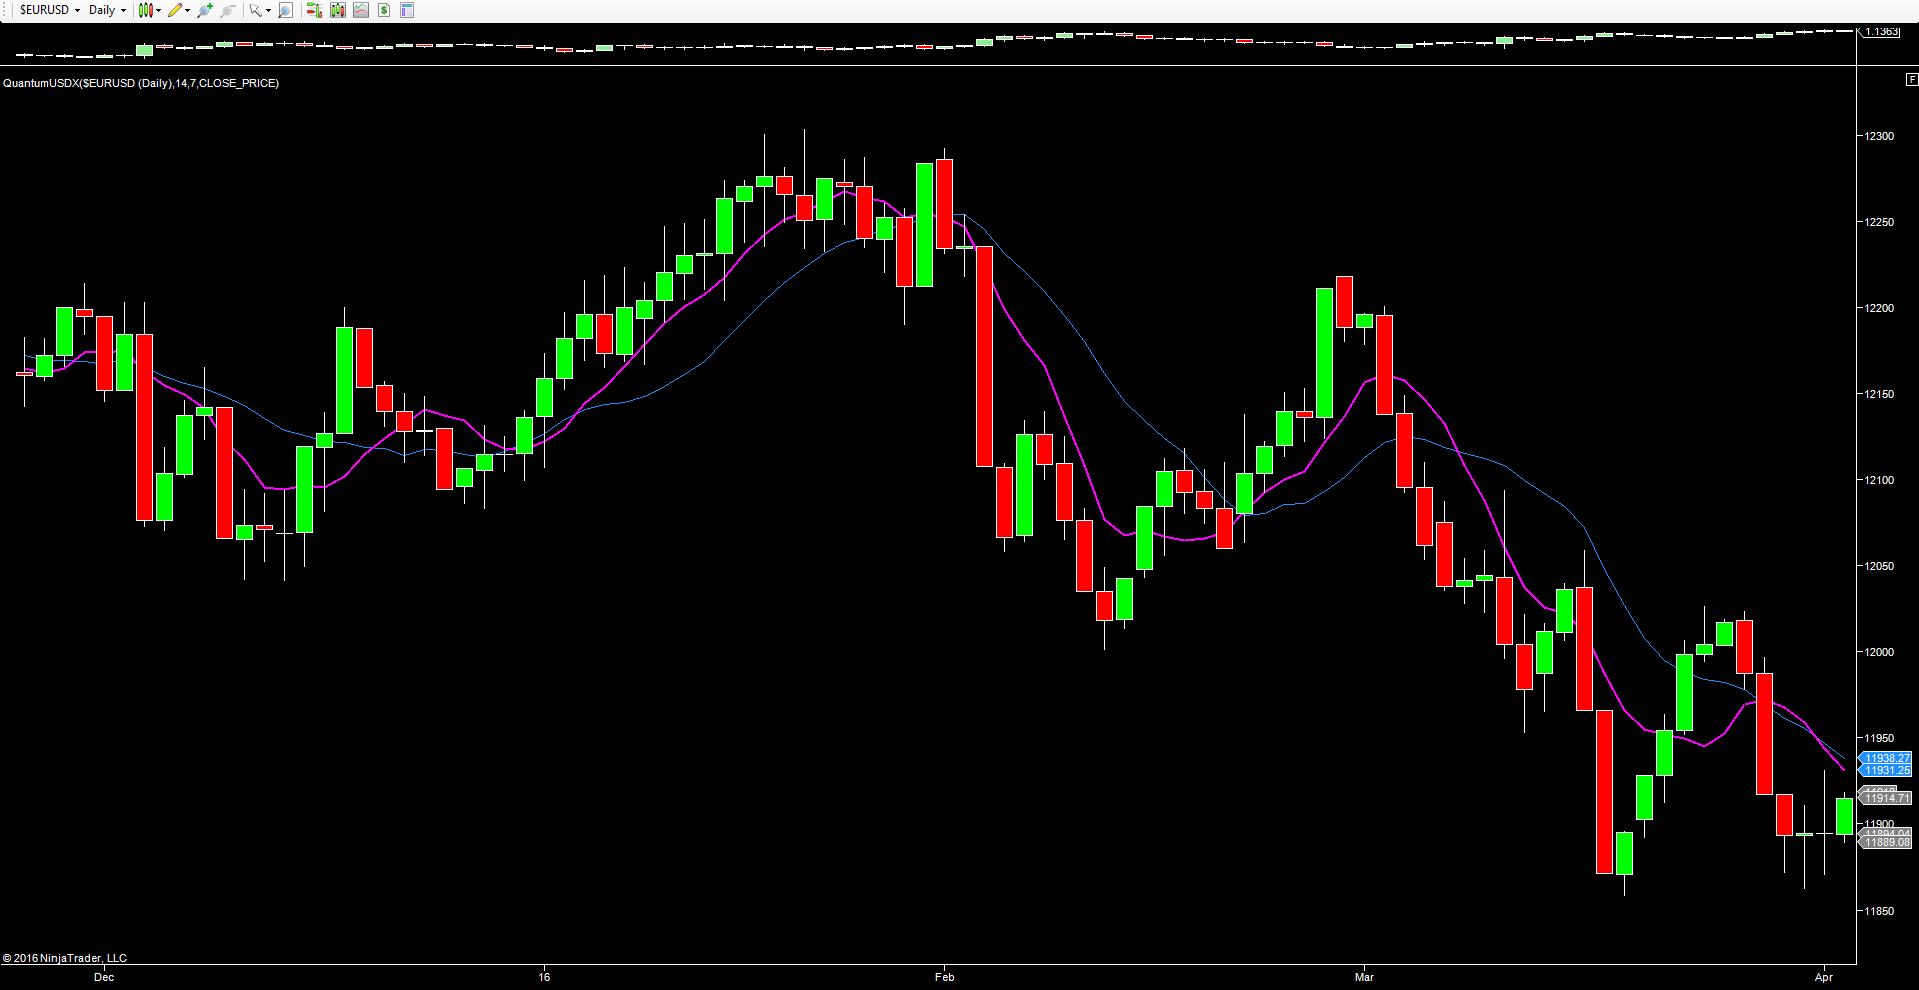 USDX_daily_chart_quantum_trading